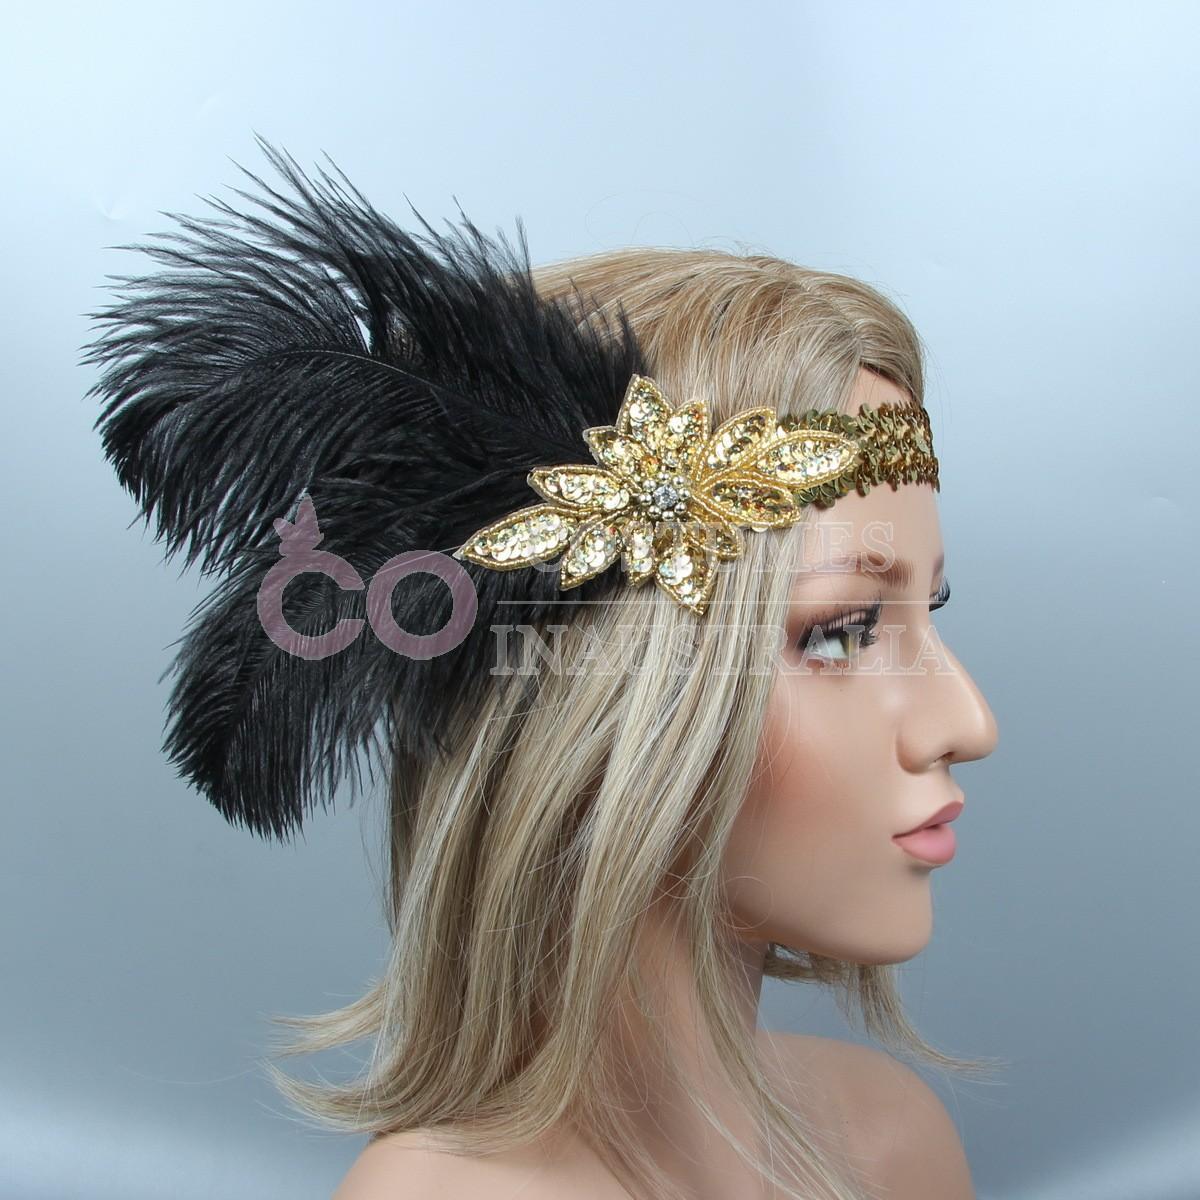 Headpieces For Weddings Australia: 1920s Headband Black Feather Gold Bridal Great Gatsby 20s